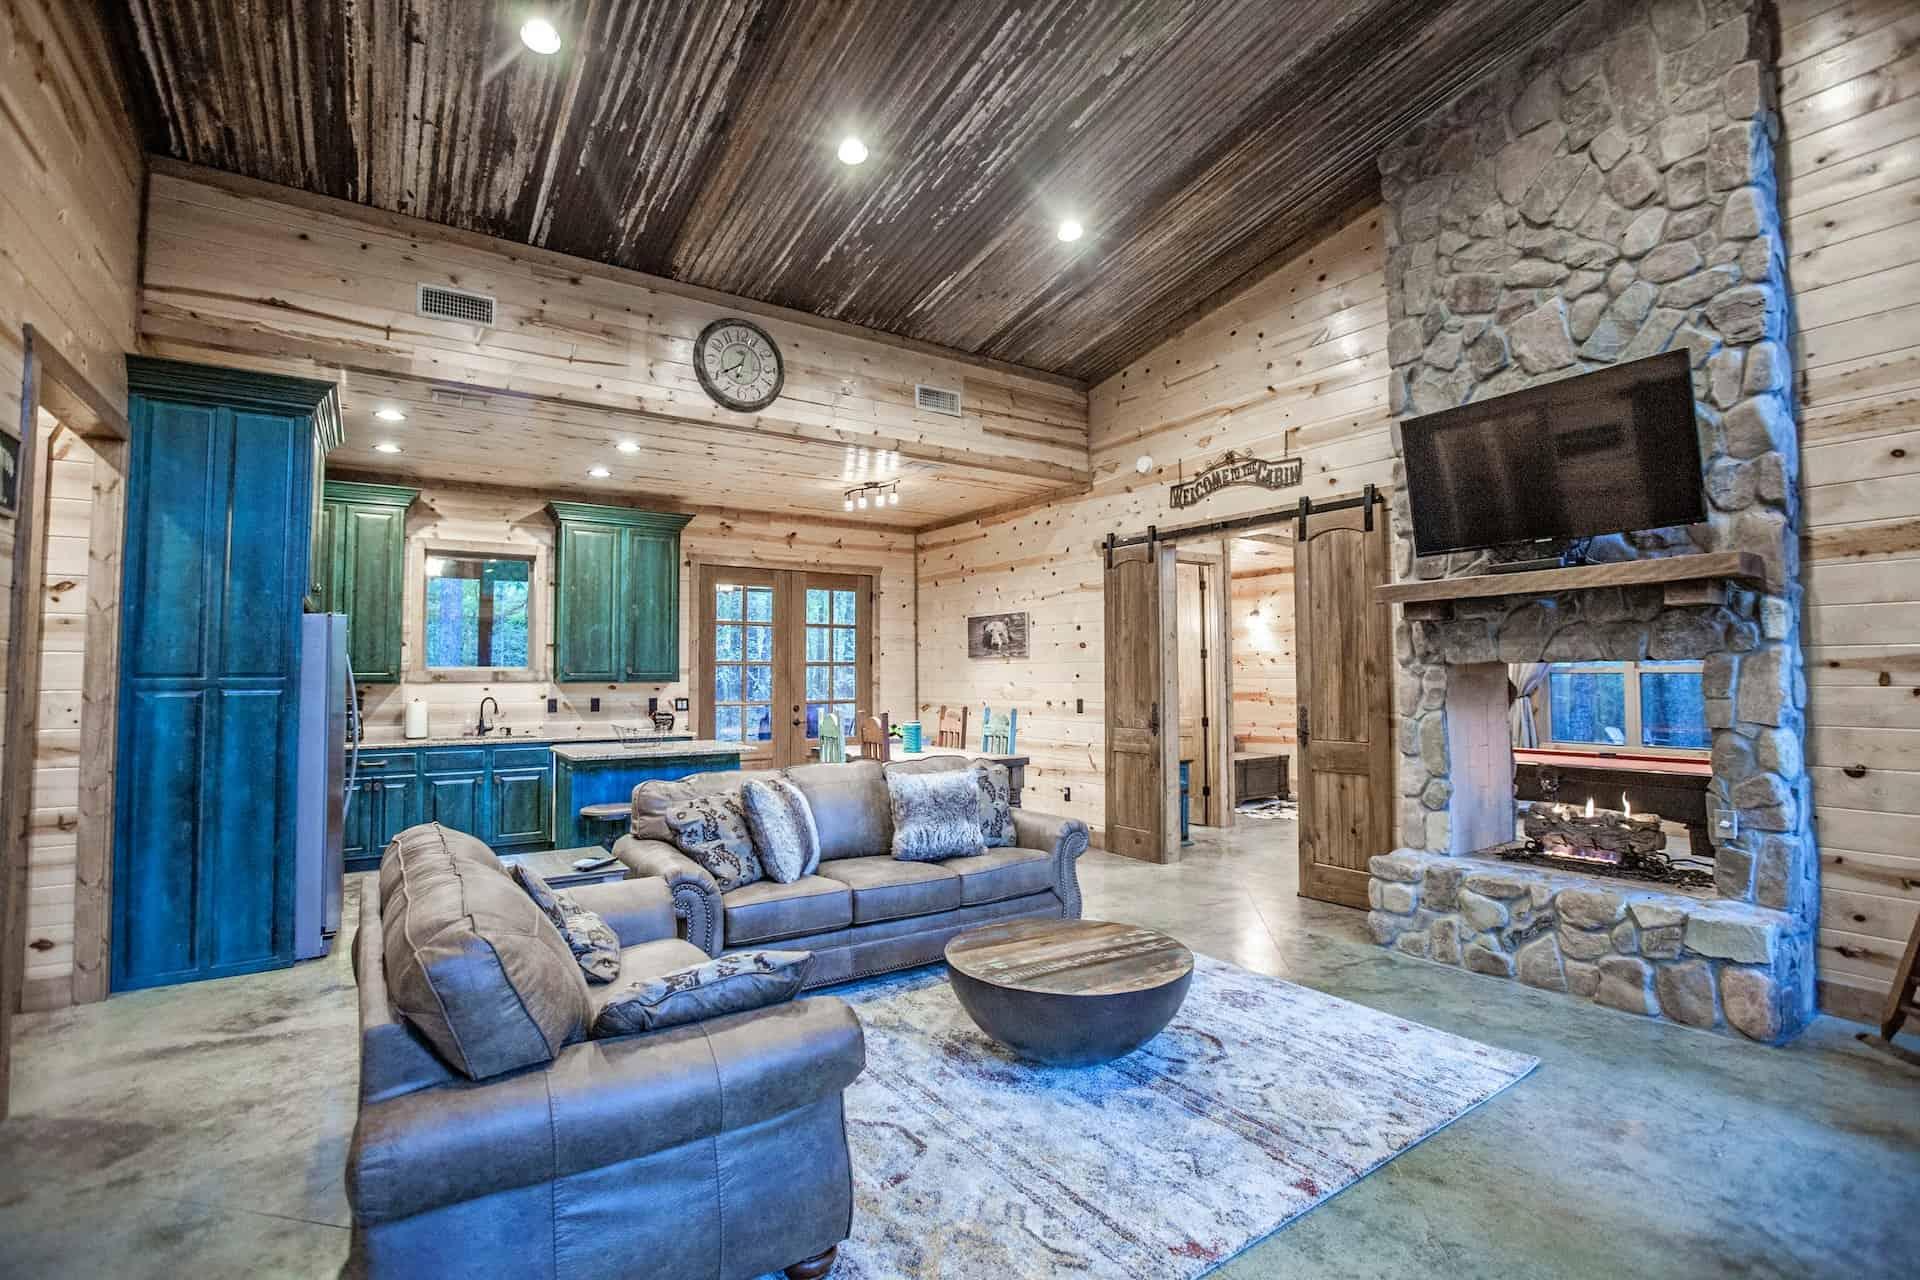 Image of luxury cabin in Broken Bow, Oklahoma